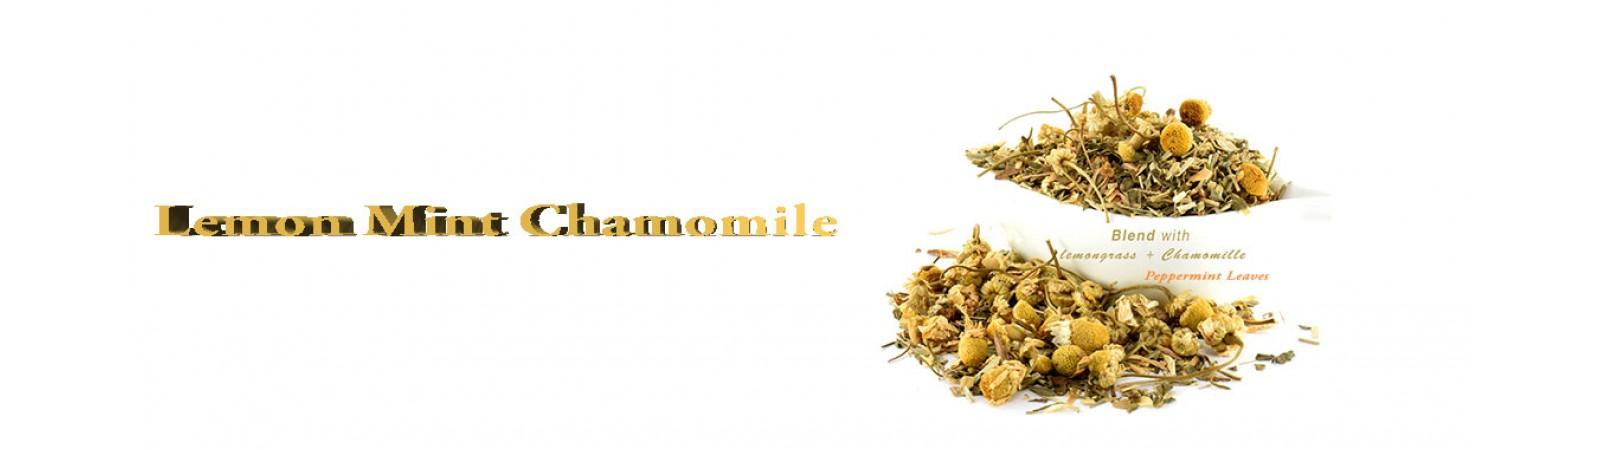 Lemon Mint Chamomile